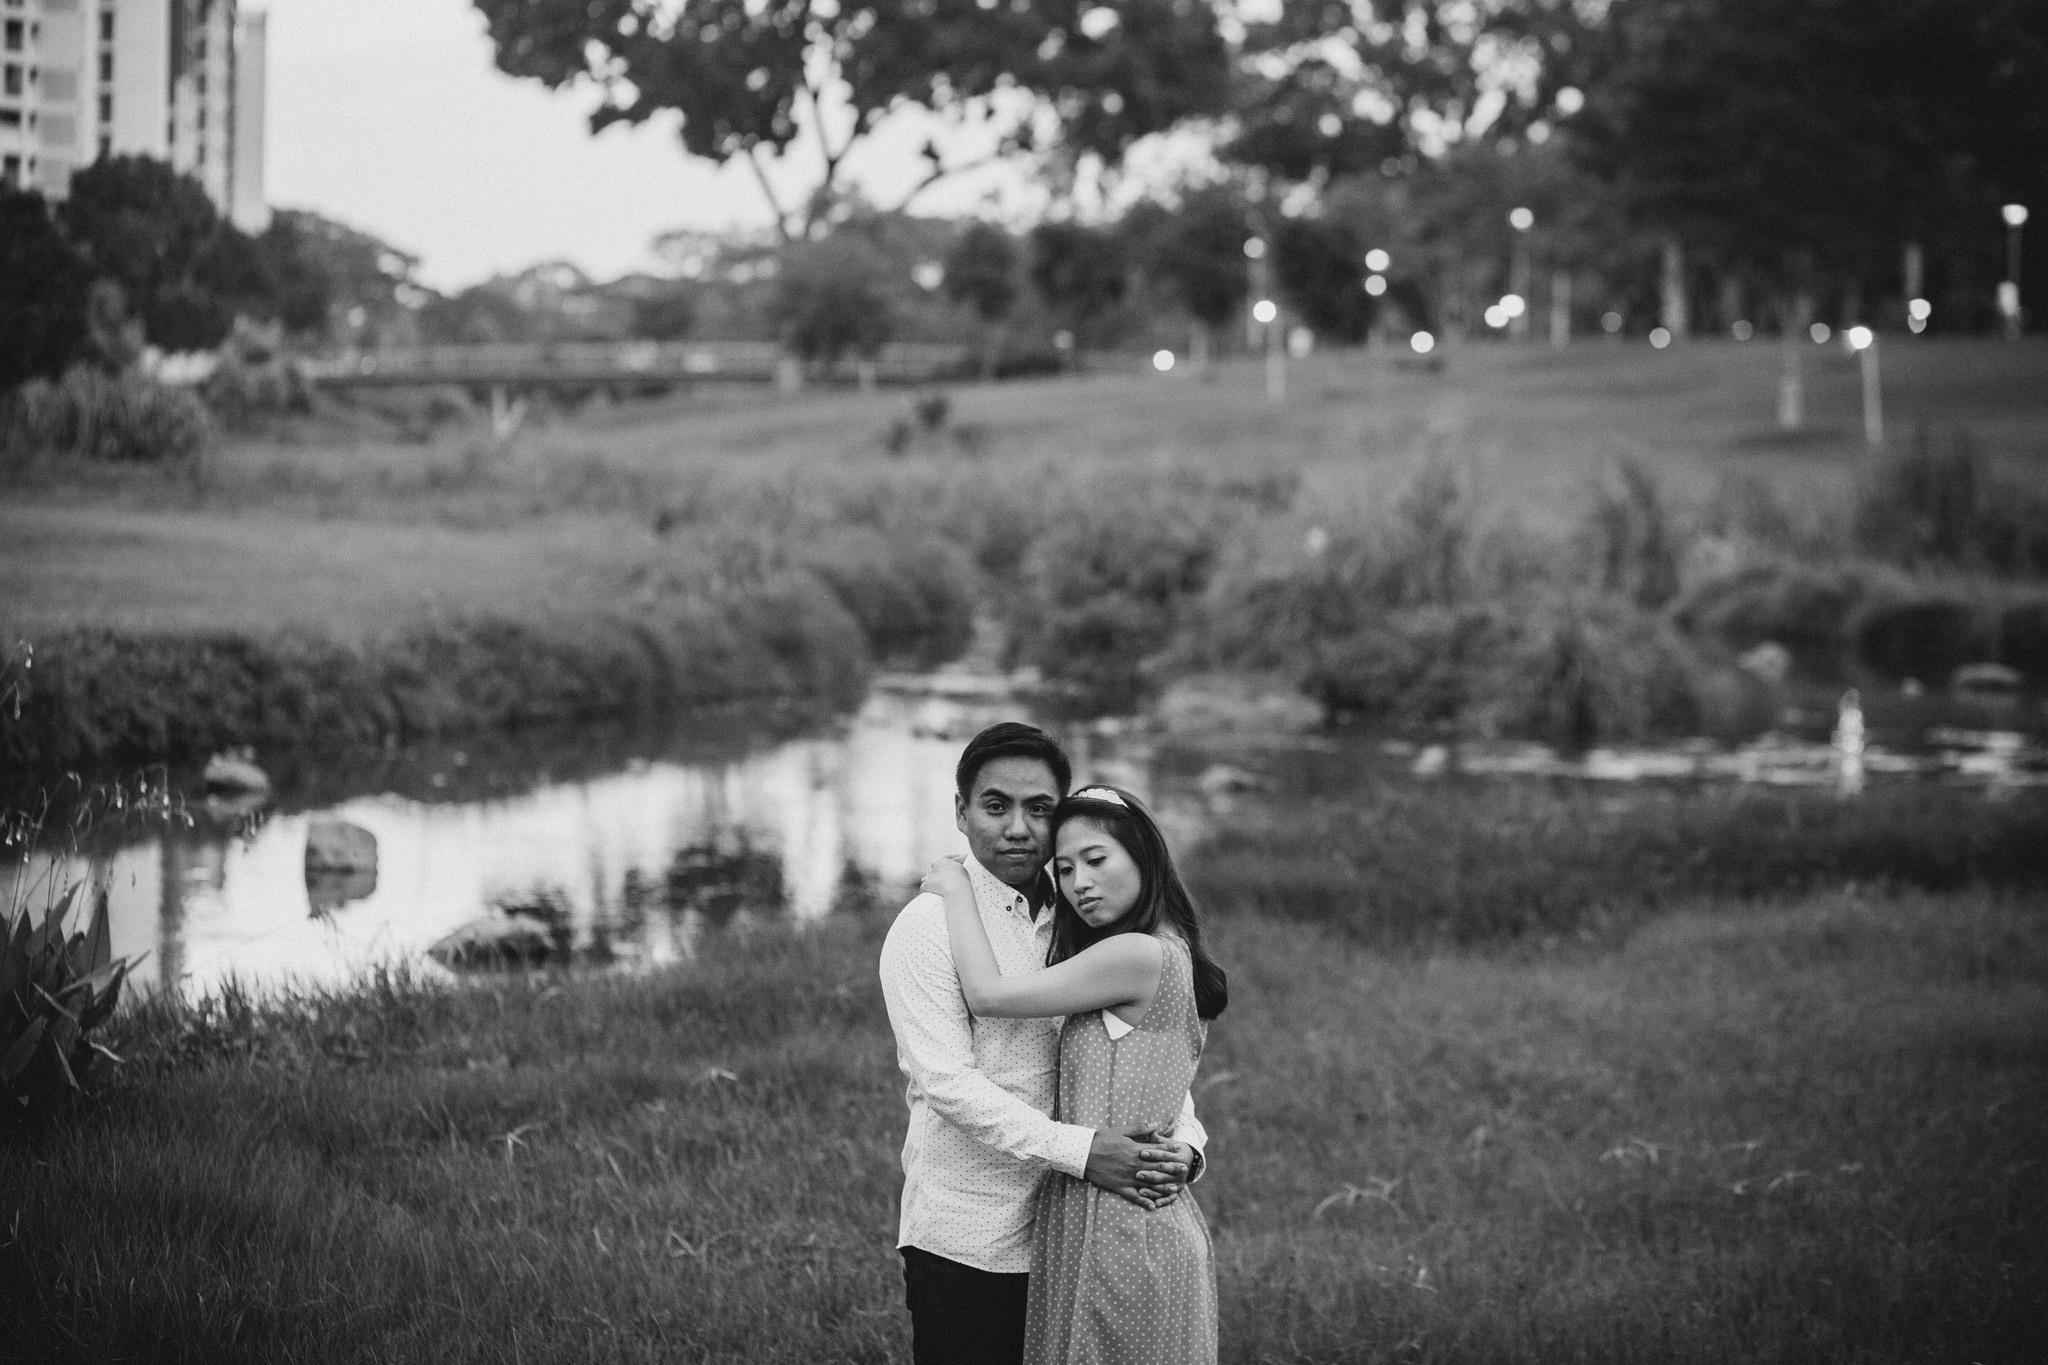 singapore--wedding-photographer-commercial-editorial-travel-wemadethese-firdaus-sasha-sessions-19.jpg